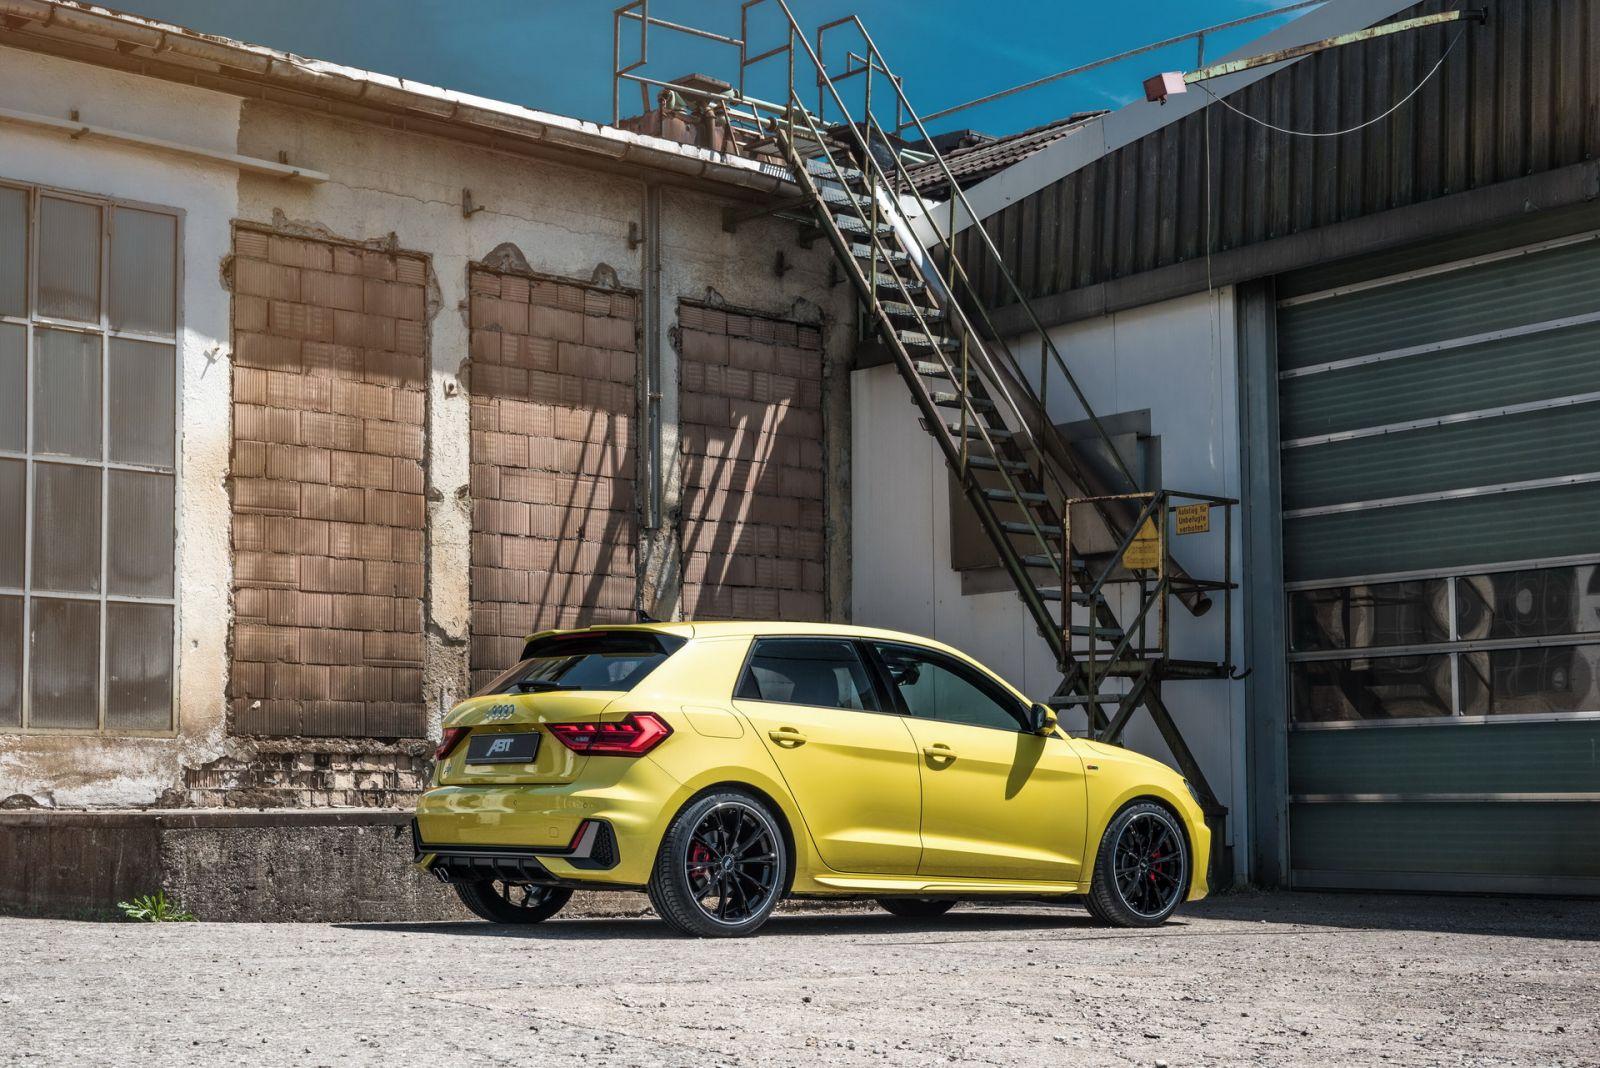 Audi A1 40 TFS ตัวใหม่ เพิ่มความแรงโดย ABT Sportsline 2